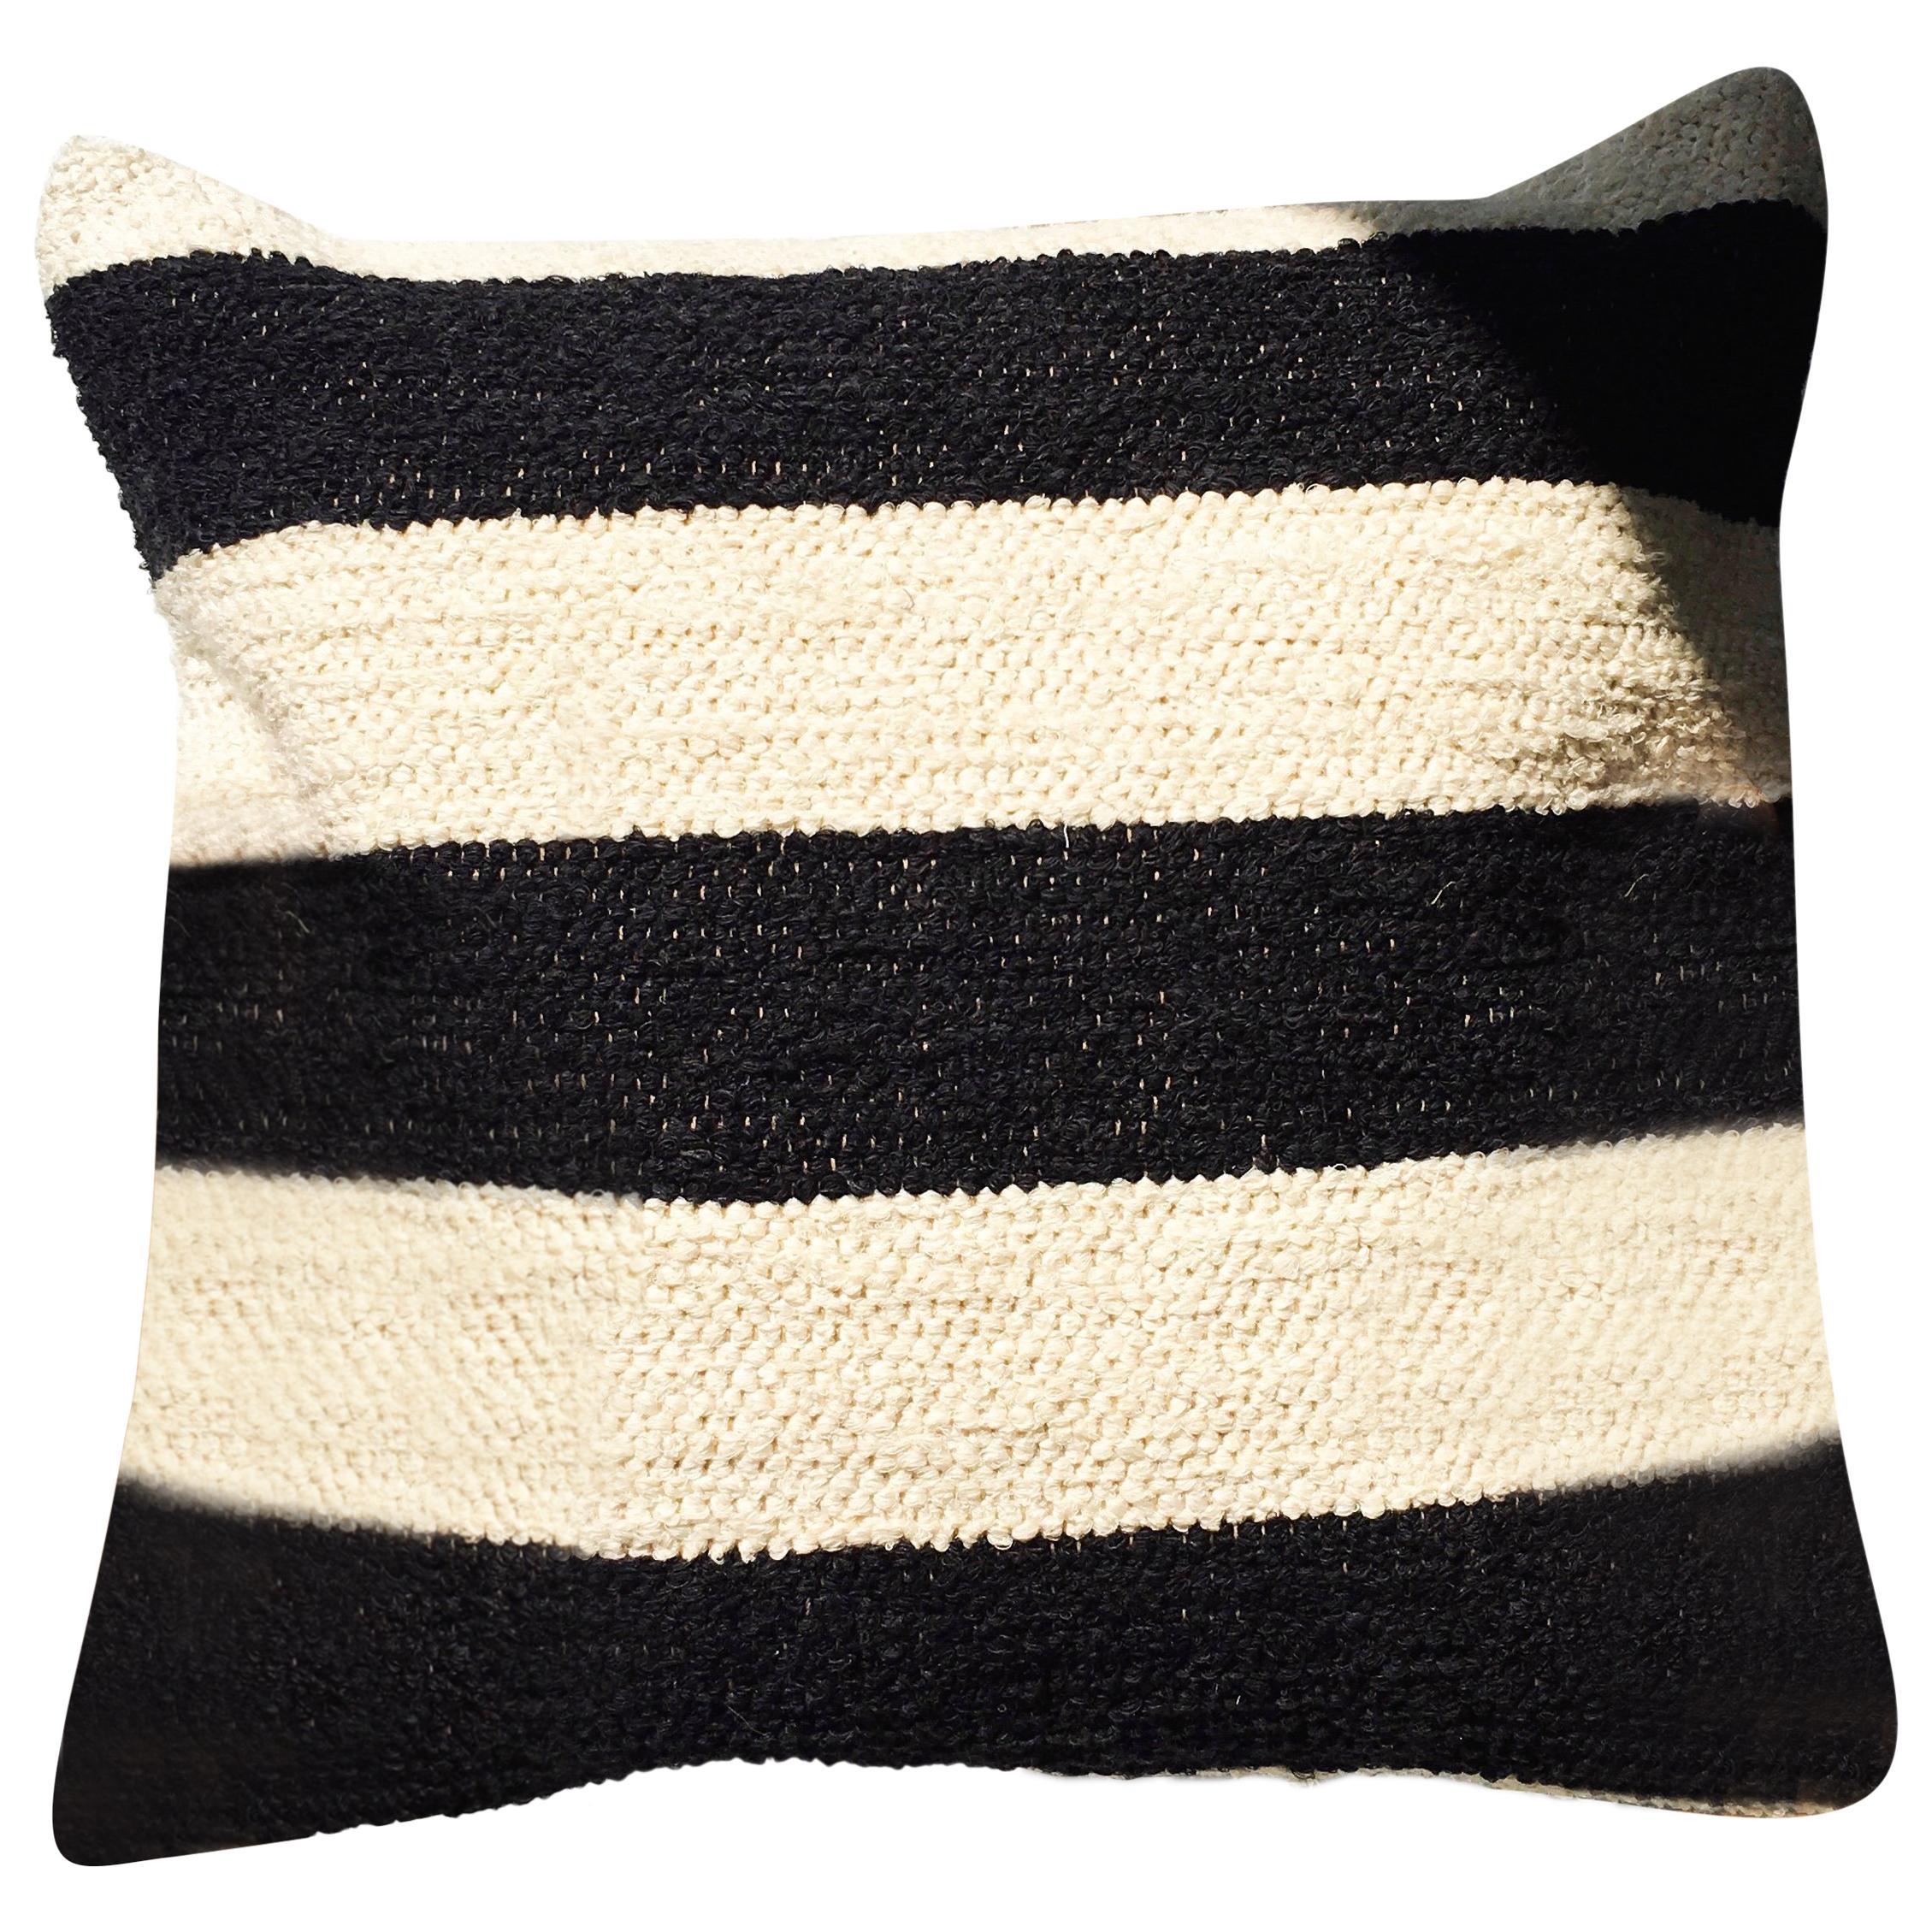 Handwoven Cotton Bold Stripe Throw Pillow, in Stock